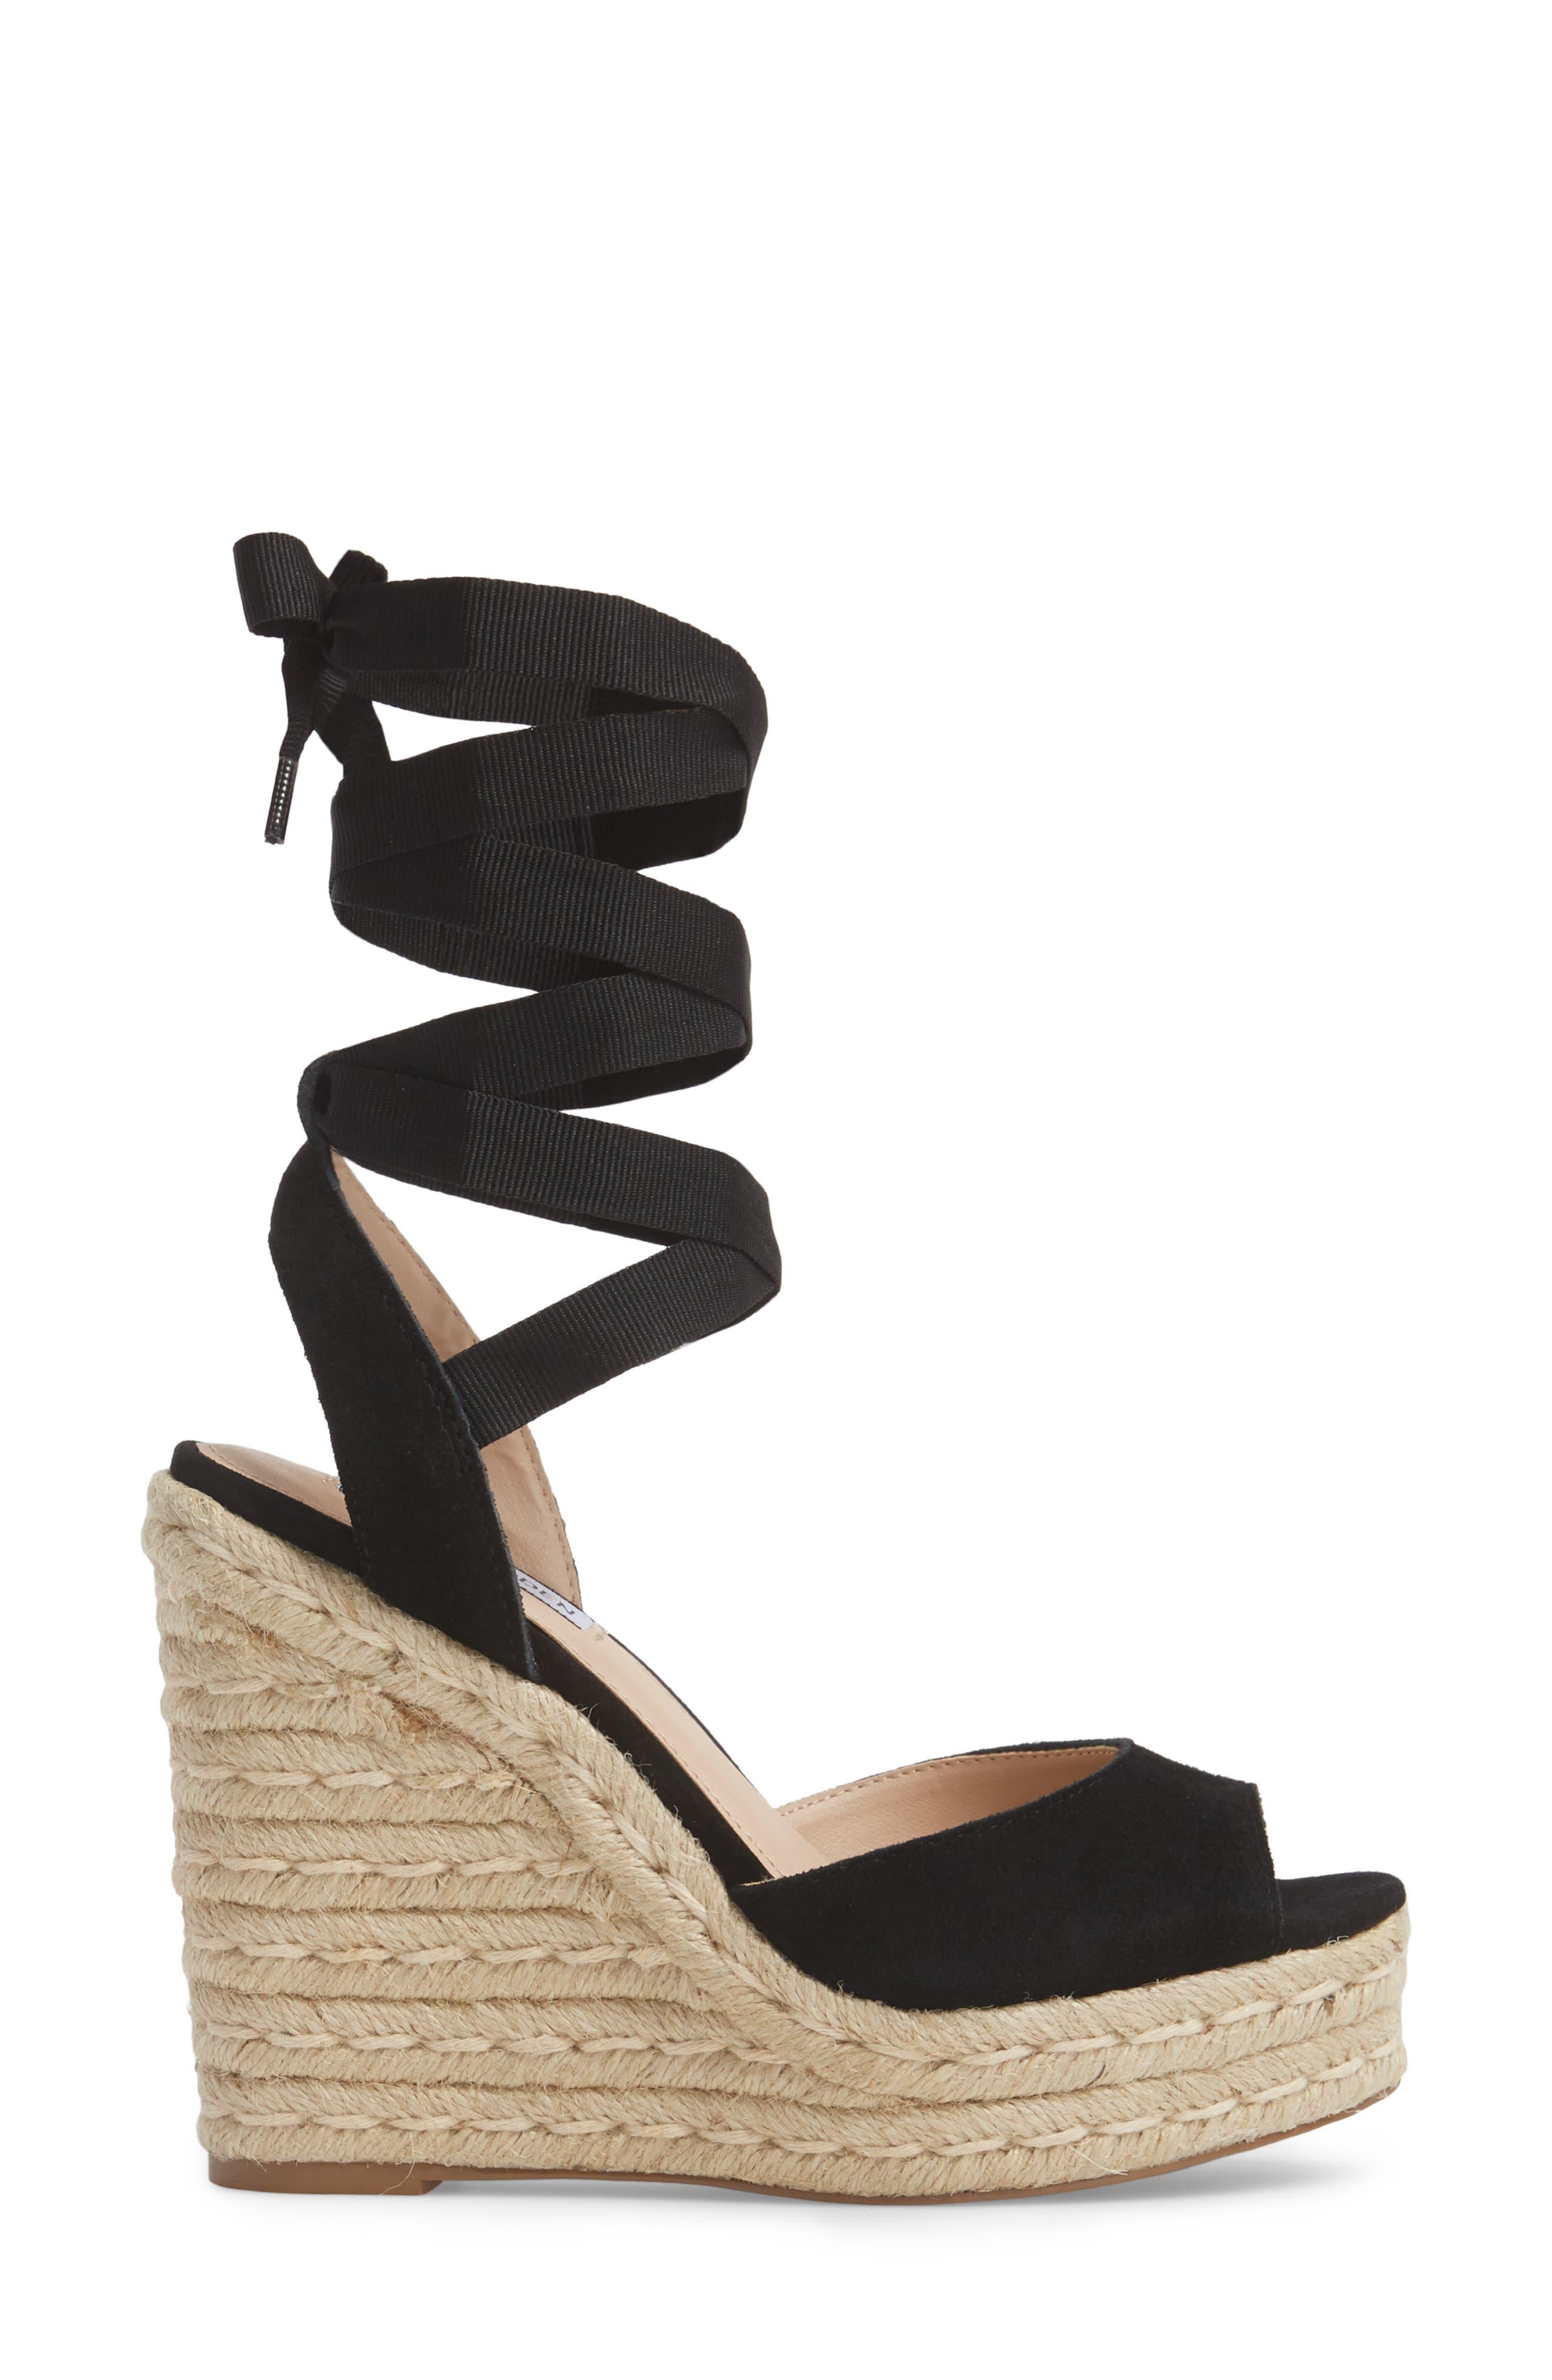 Secret Wedge Wraparound Sandal,                             Alternate thumbnail 3, color,                             Black Suede